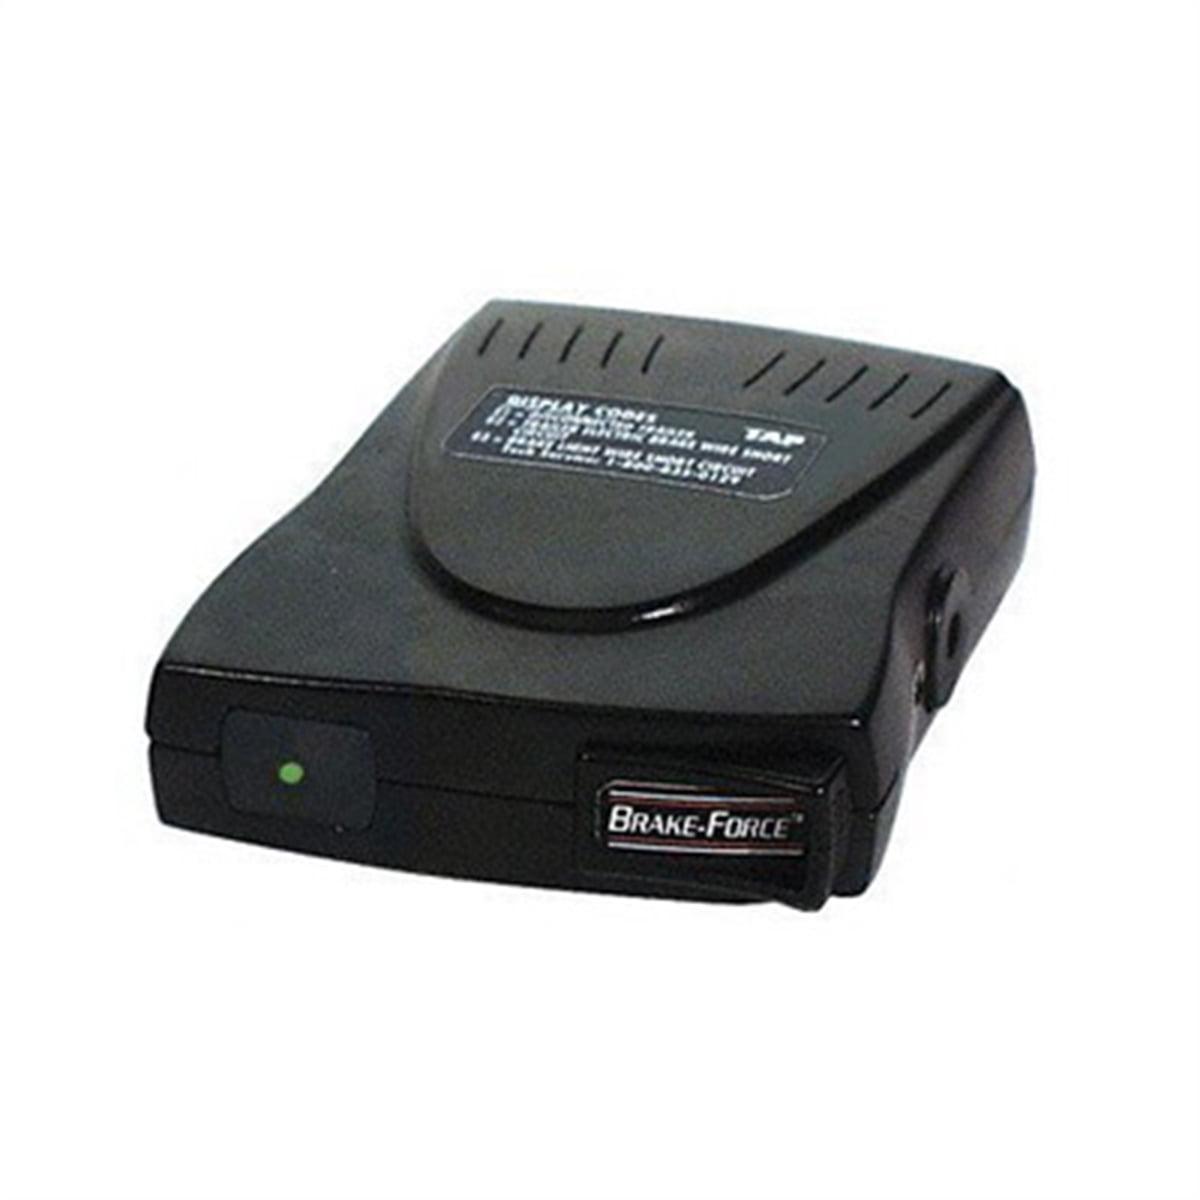 BRAKE-FORCE ELECTRONIC CONTROL